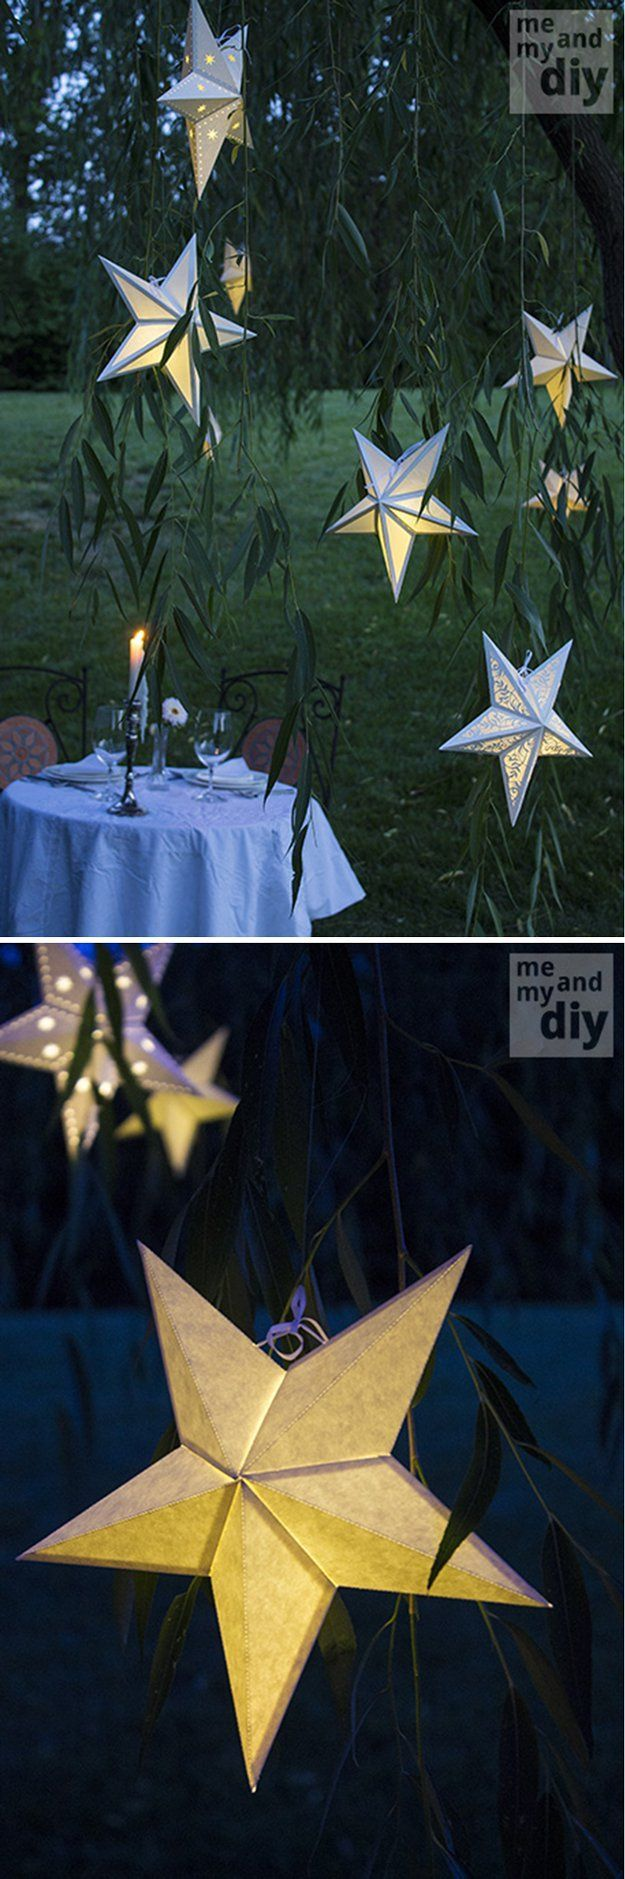 DIY Paper Lantern Ideas and Tutorial | Paper Star Lantern by DIY Ready at http://diyready.com/21-diy-outdoor-lantern-ideas/